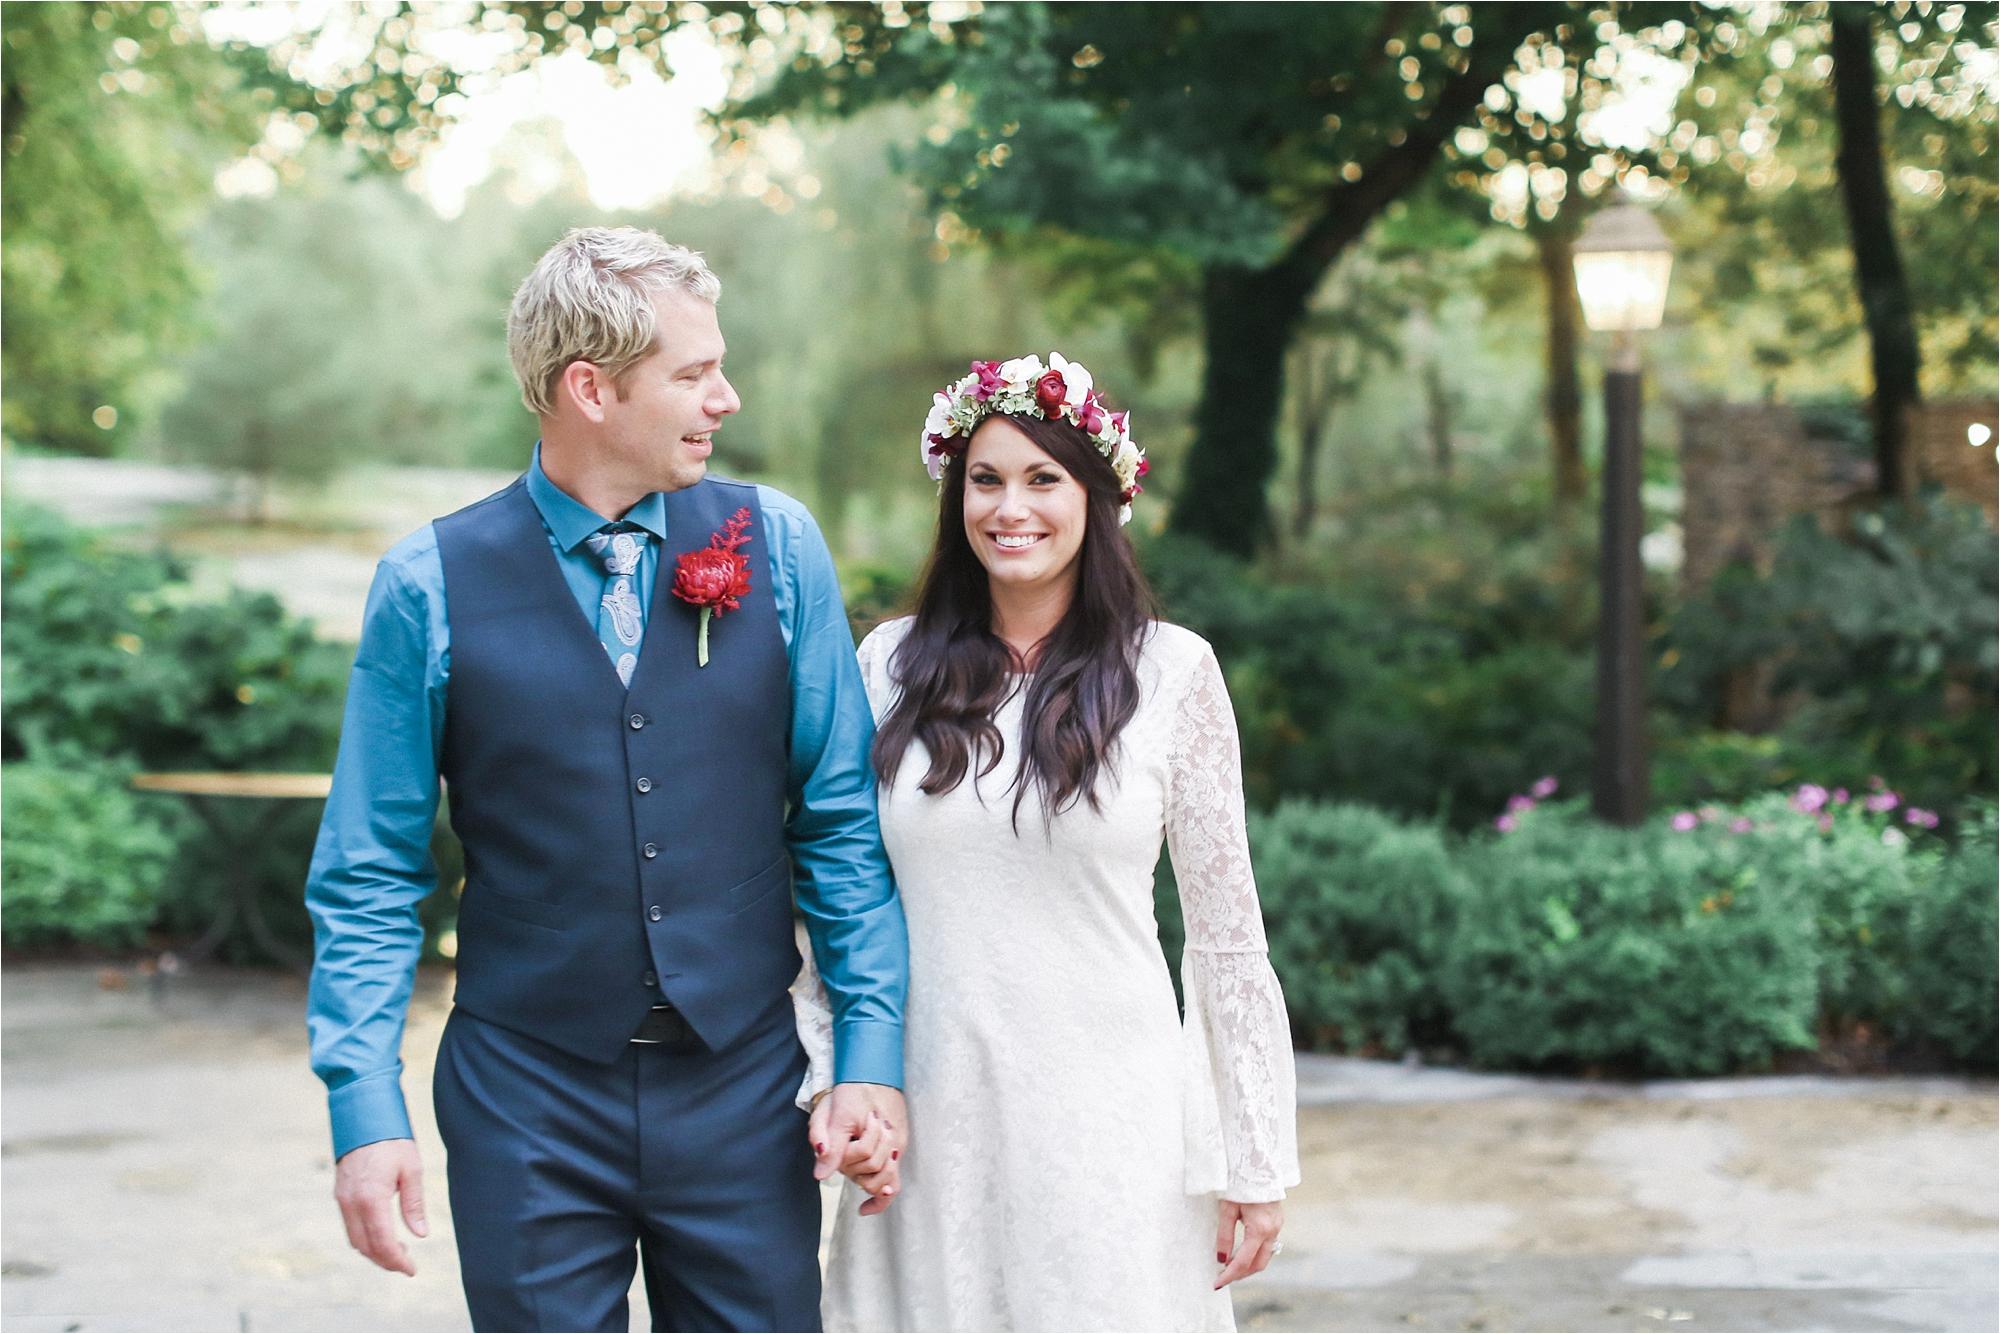 stephanie-yonce-photography-richmond-virginia-bohemian-outdoor-wedding-photo_0032.jpg